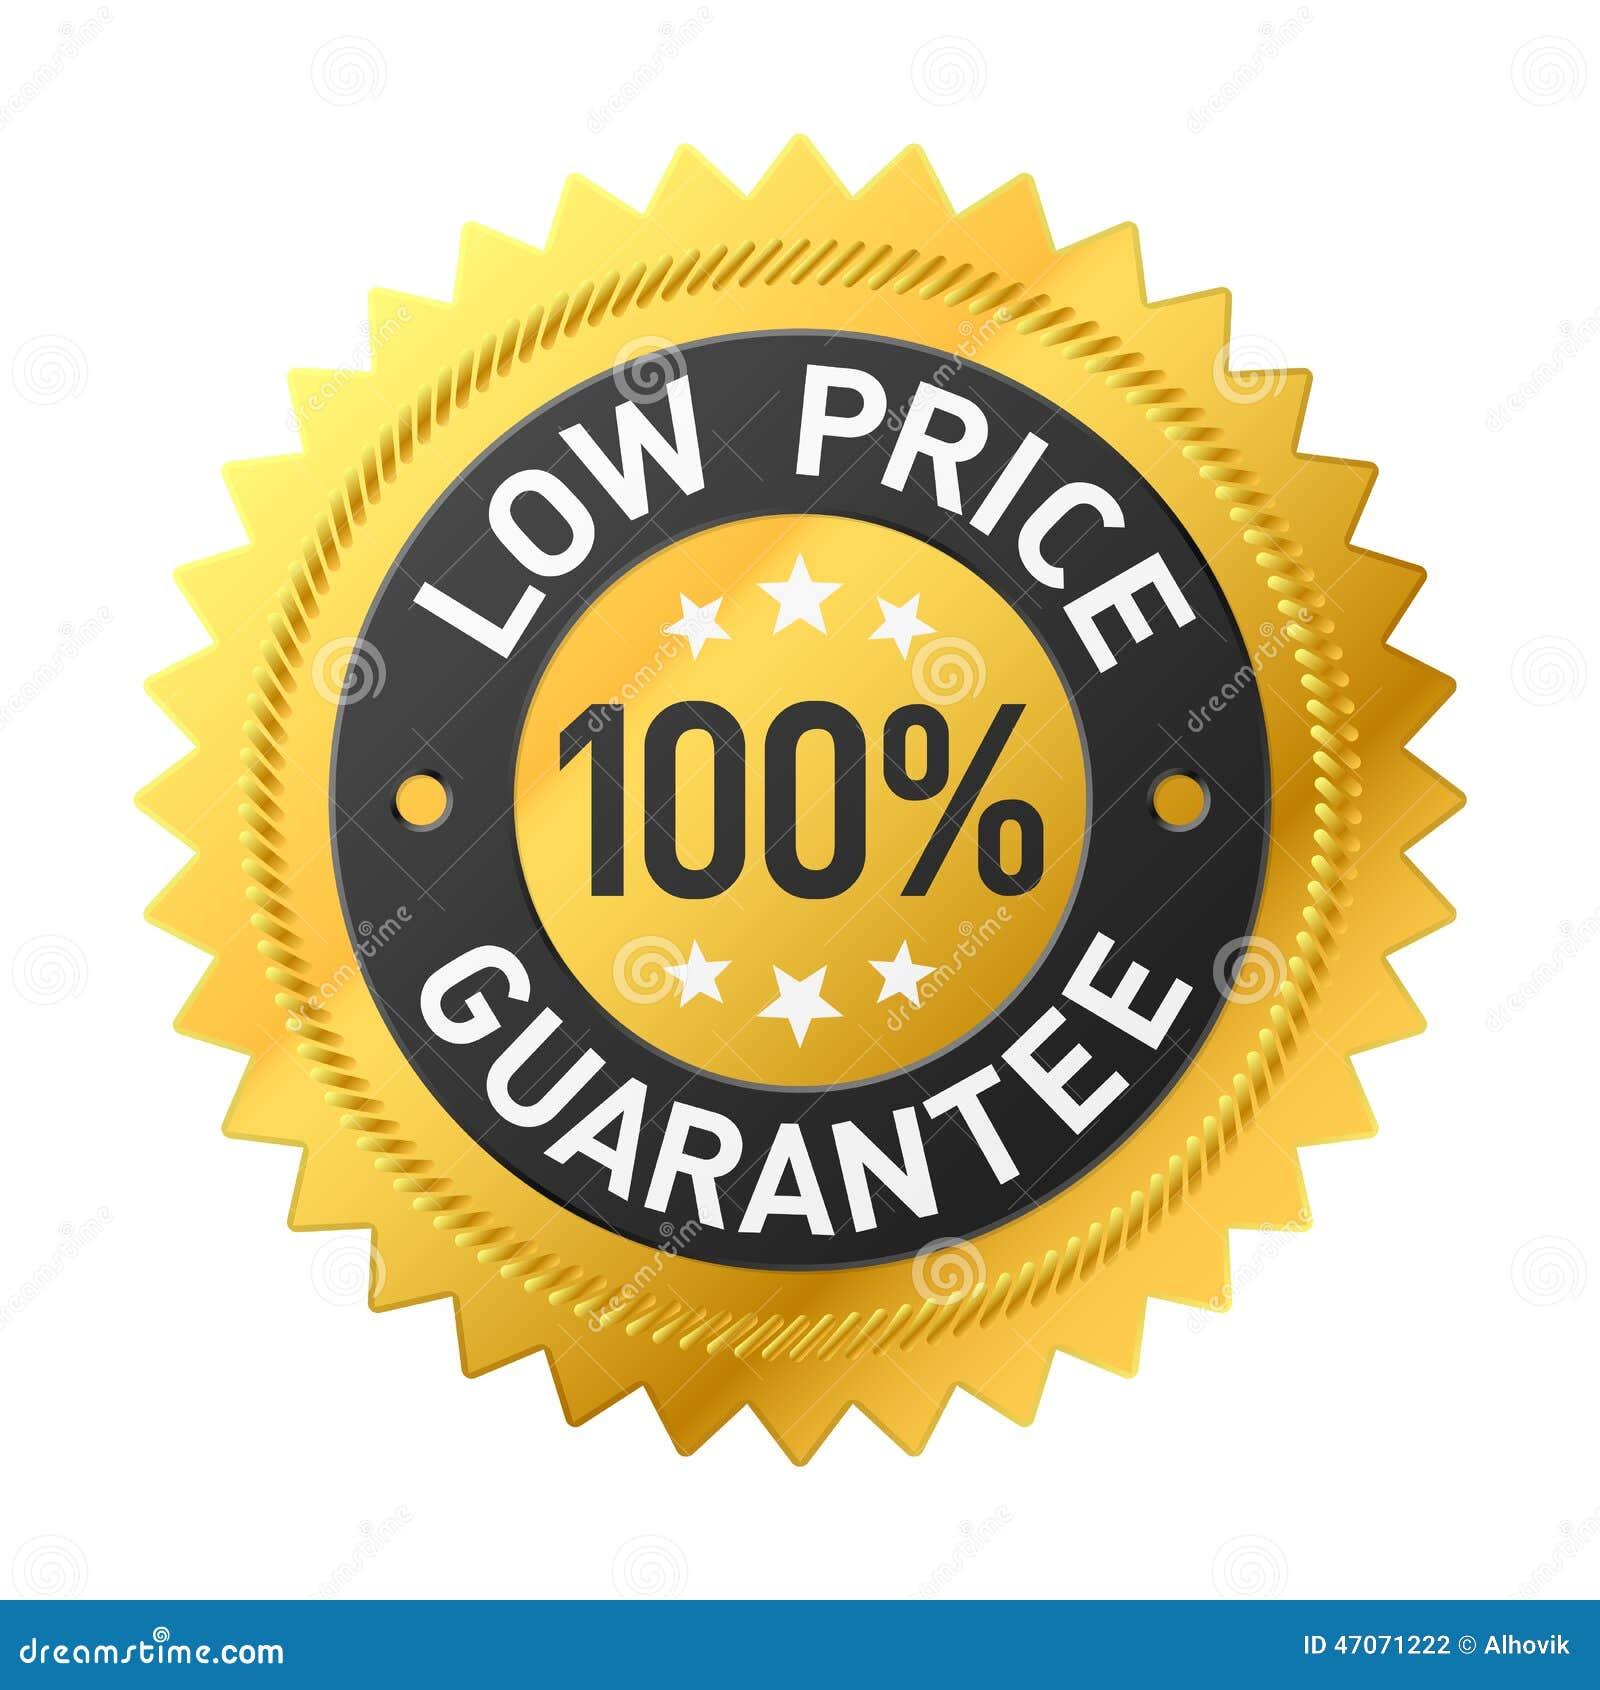 price guarantee e a the super plumber victoria the island pl